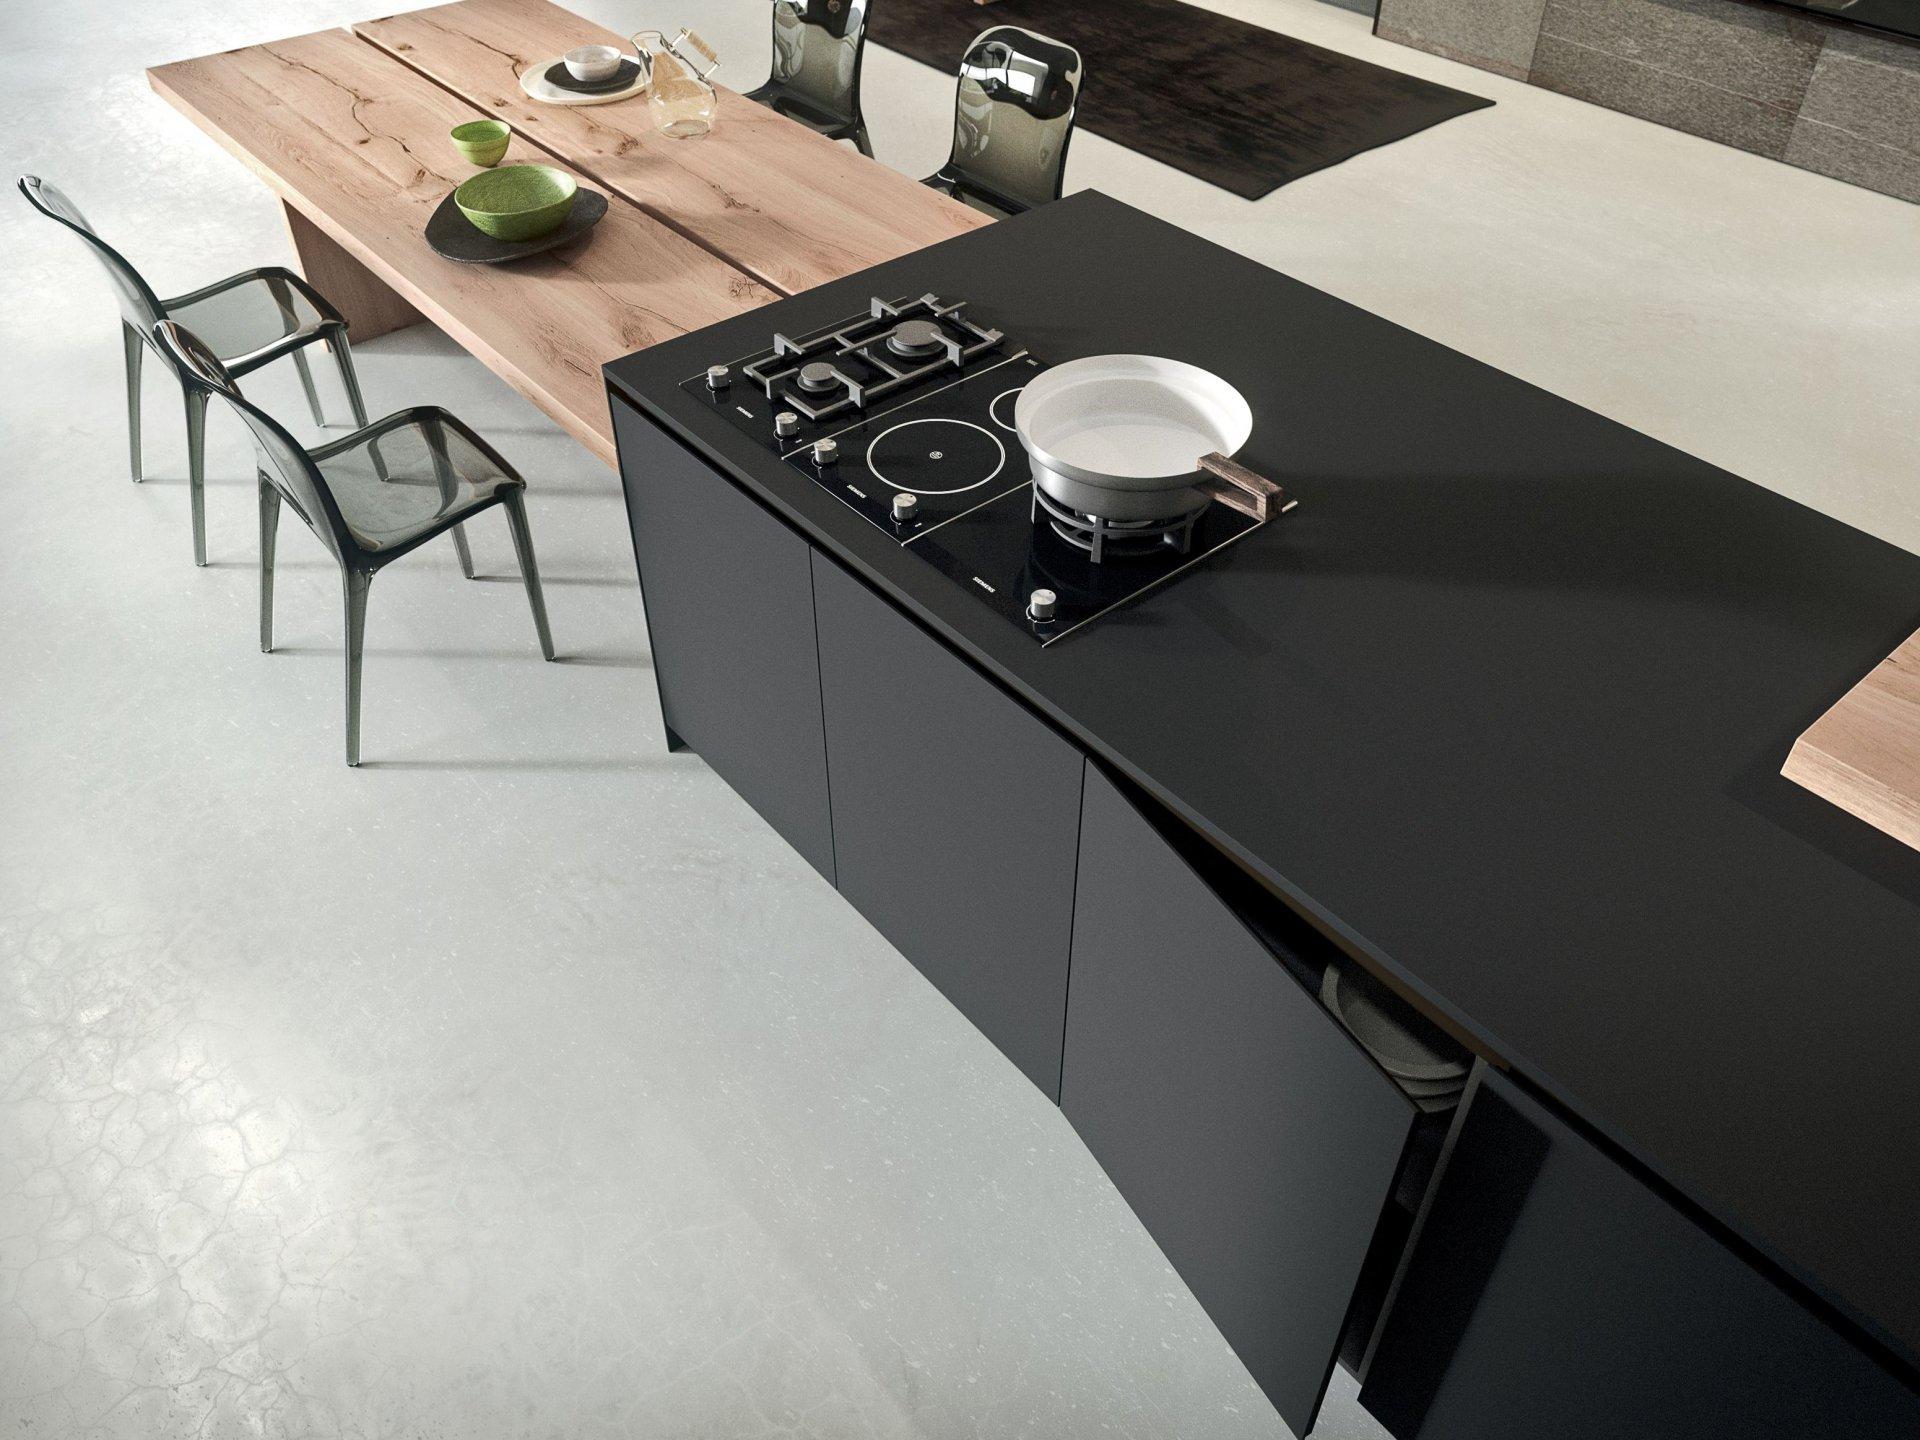 Top In Fenix Il Materiale Intelligente Per La Cucina Secondlifekitchen